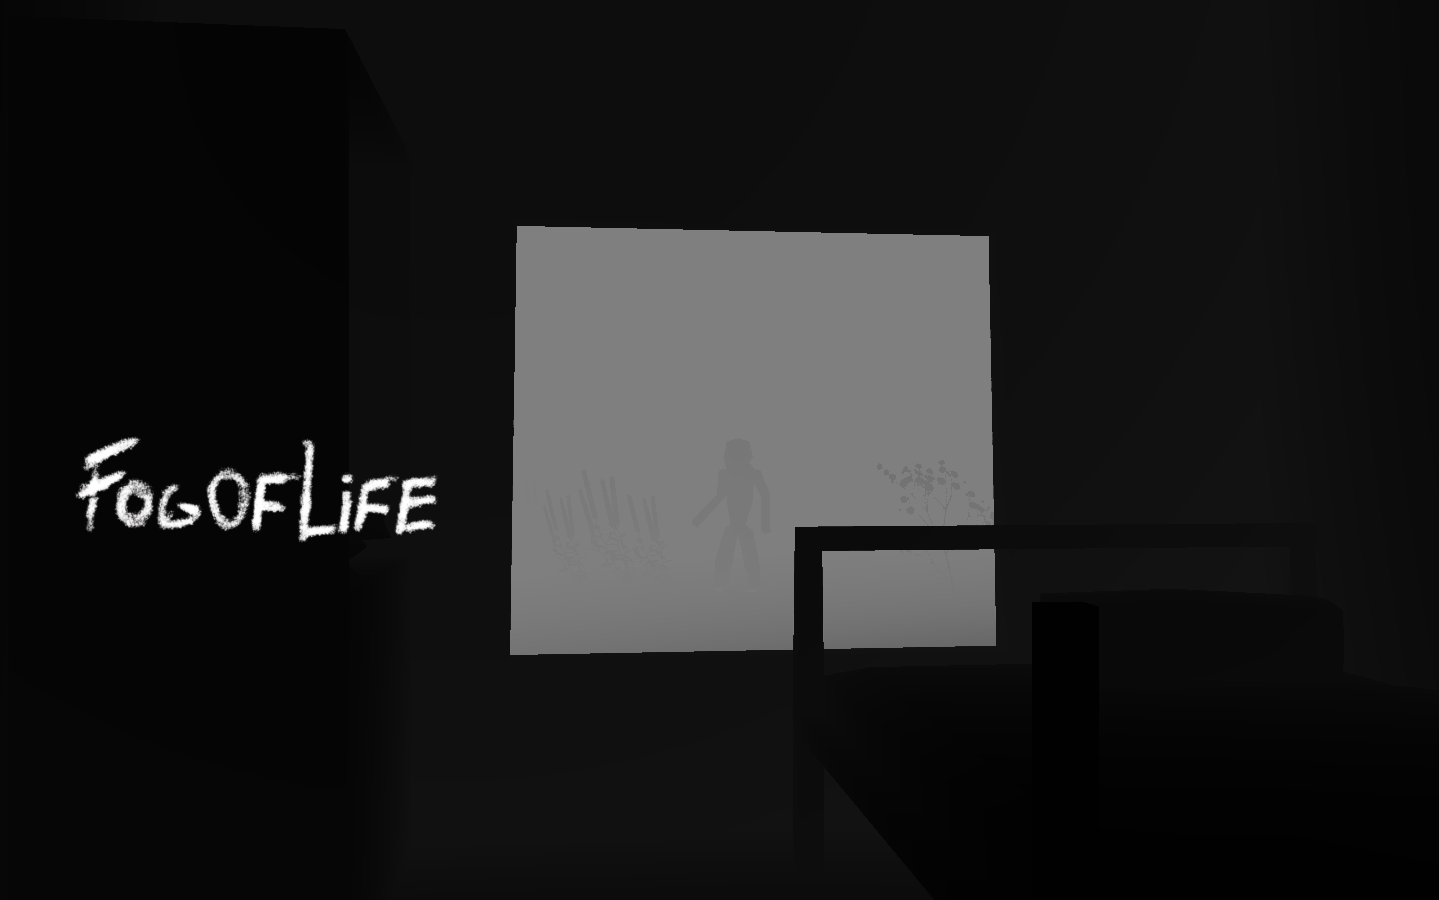 Fog of Life